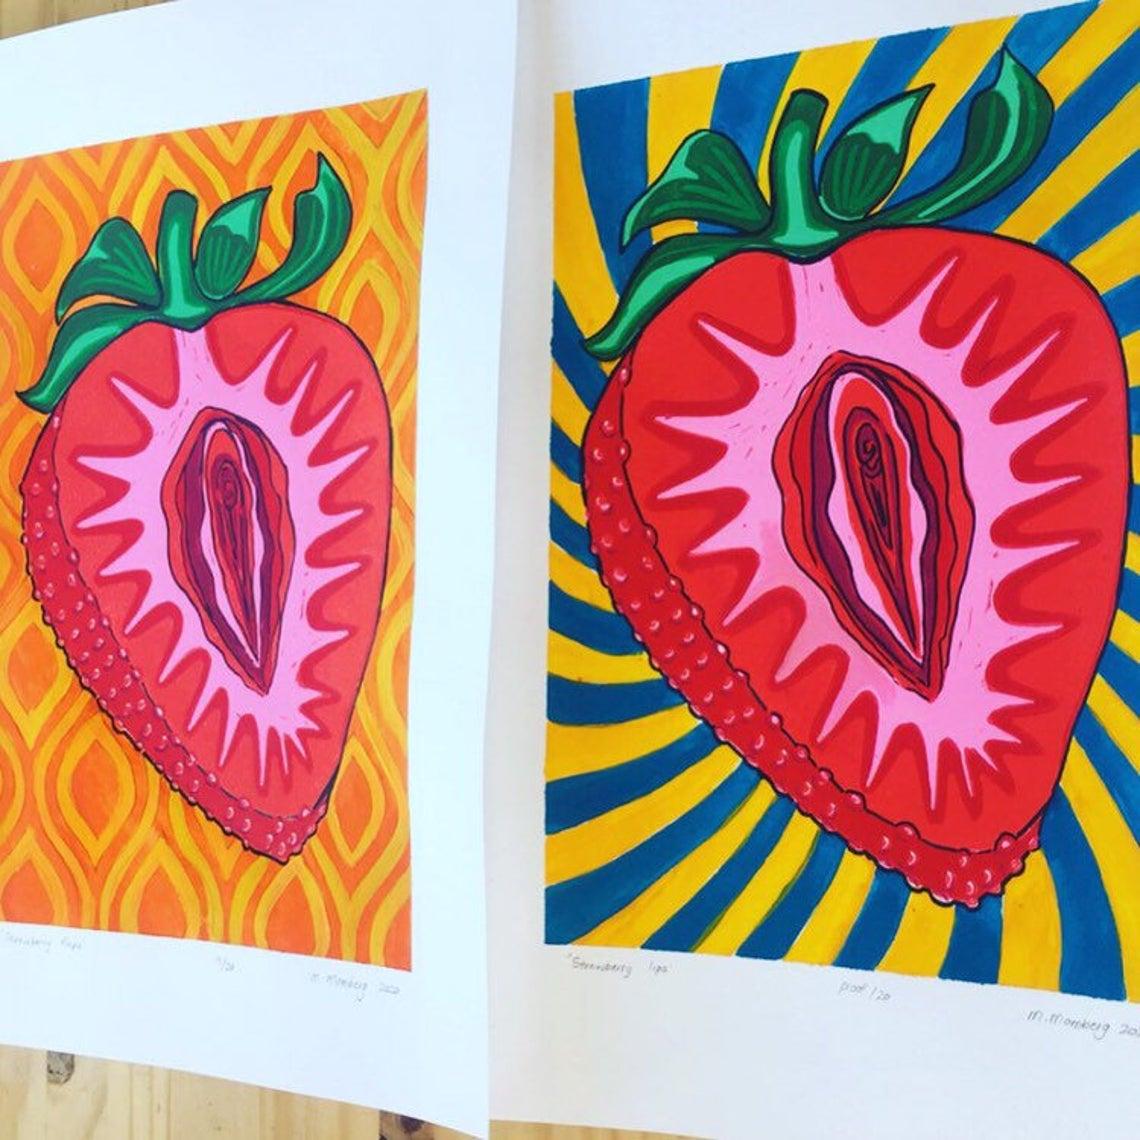 Metanoia Limited edition Linocut block print wall decor